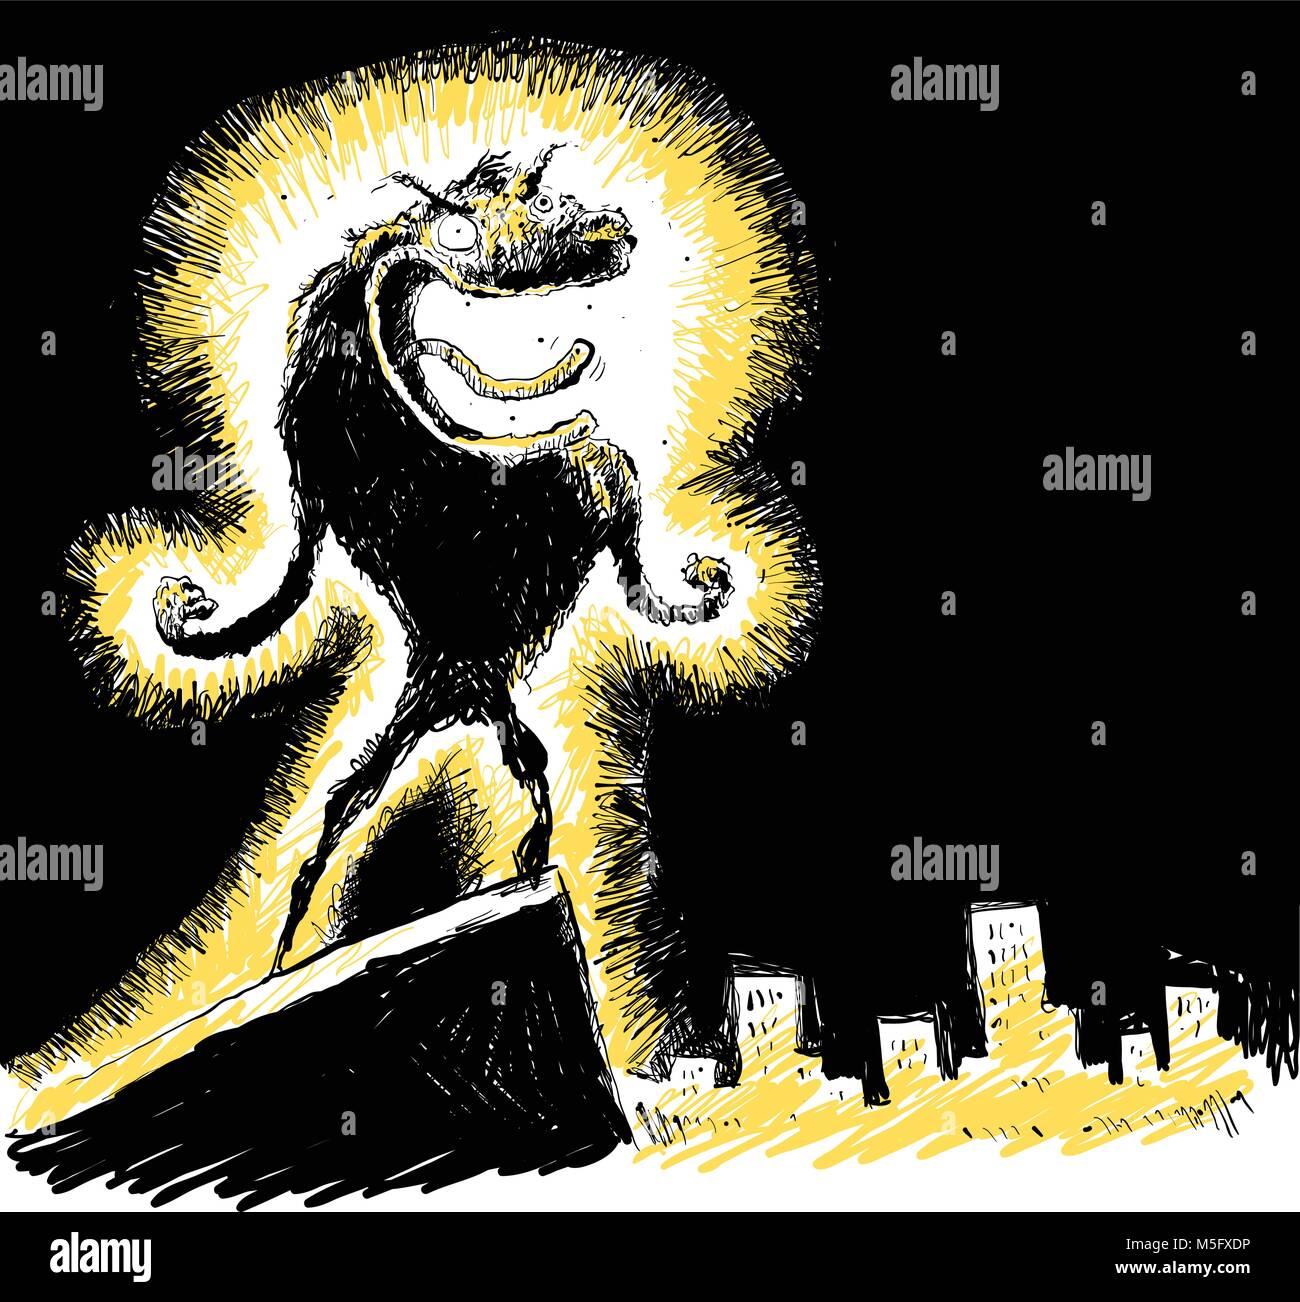 A cartoon werewolf howls above the city. - Stock Image